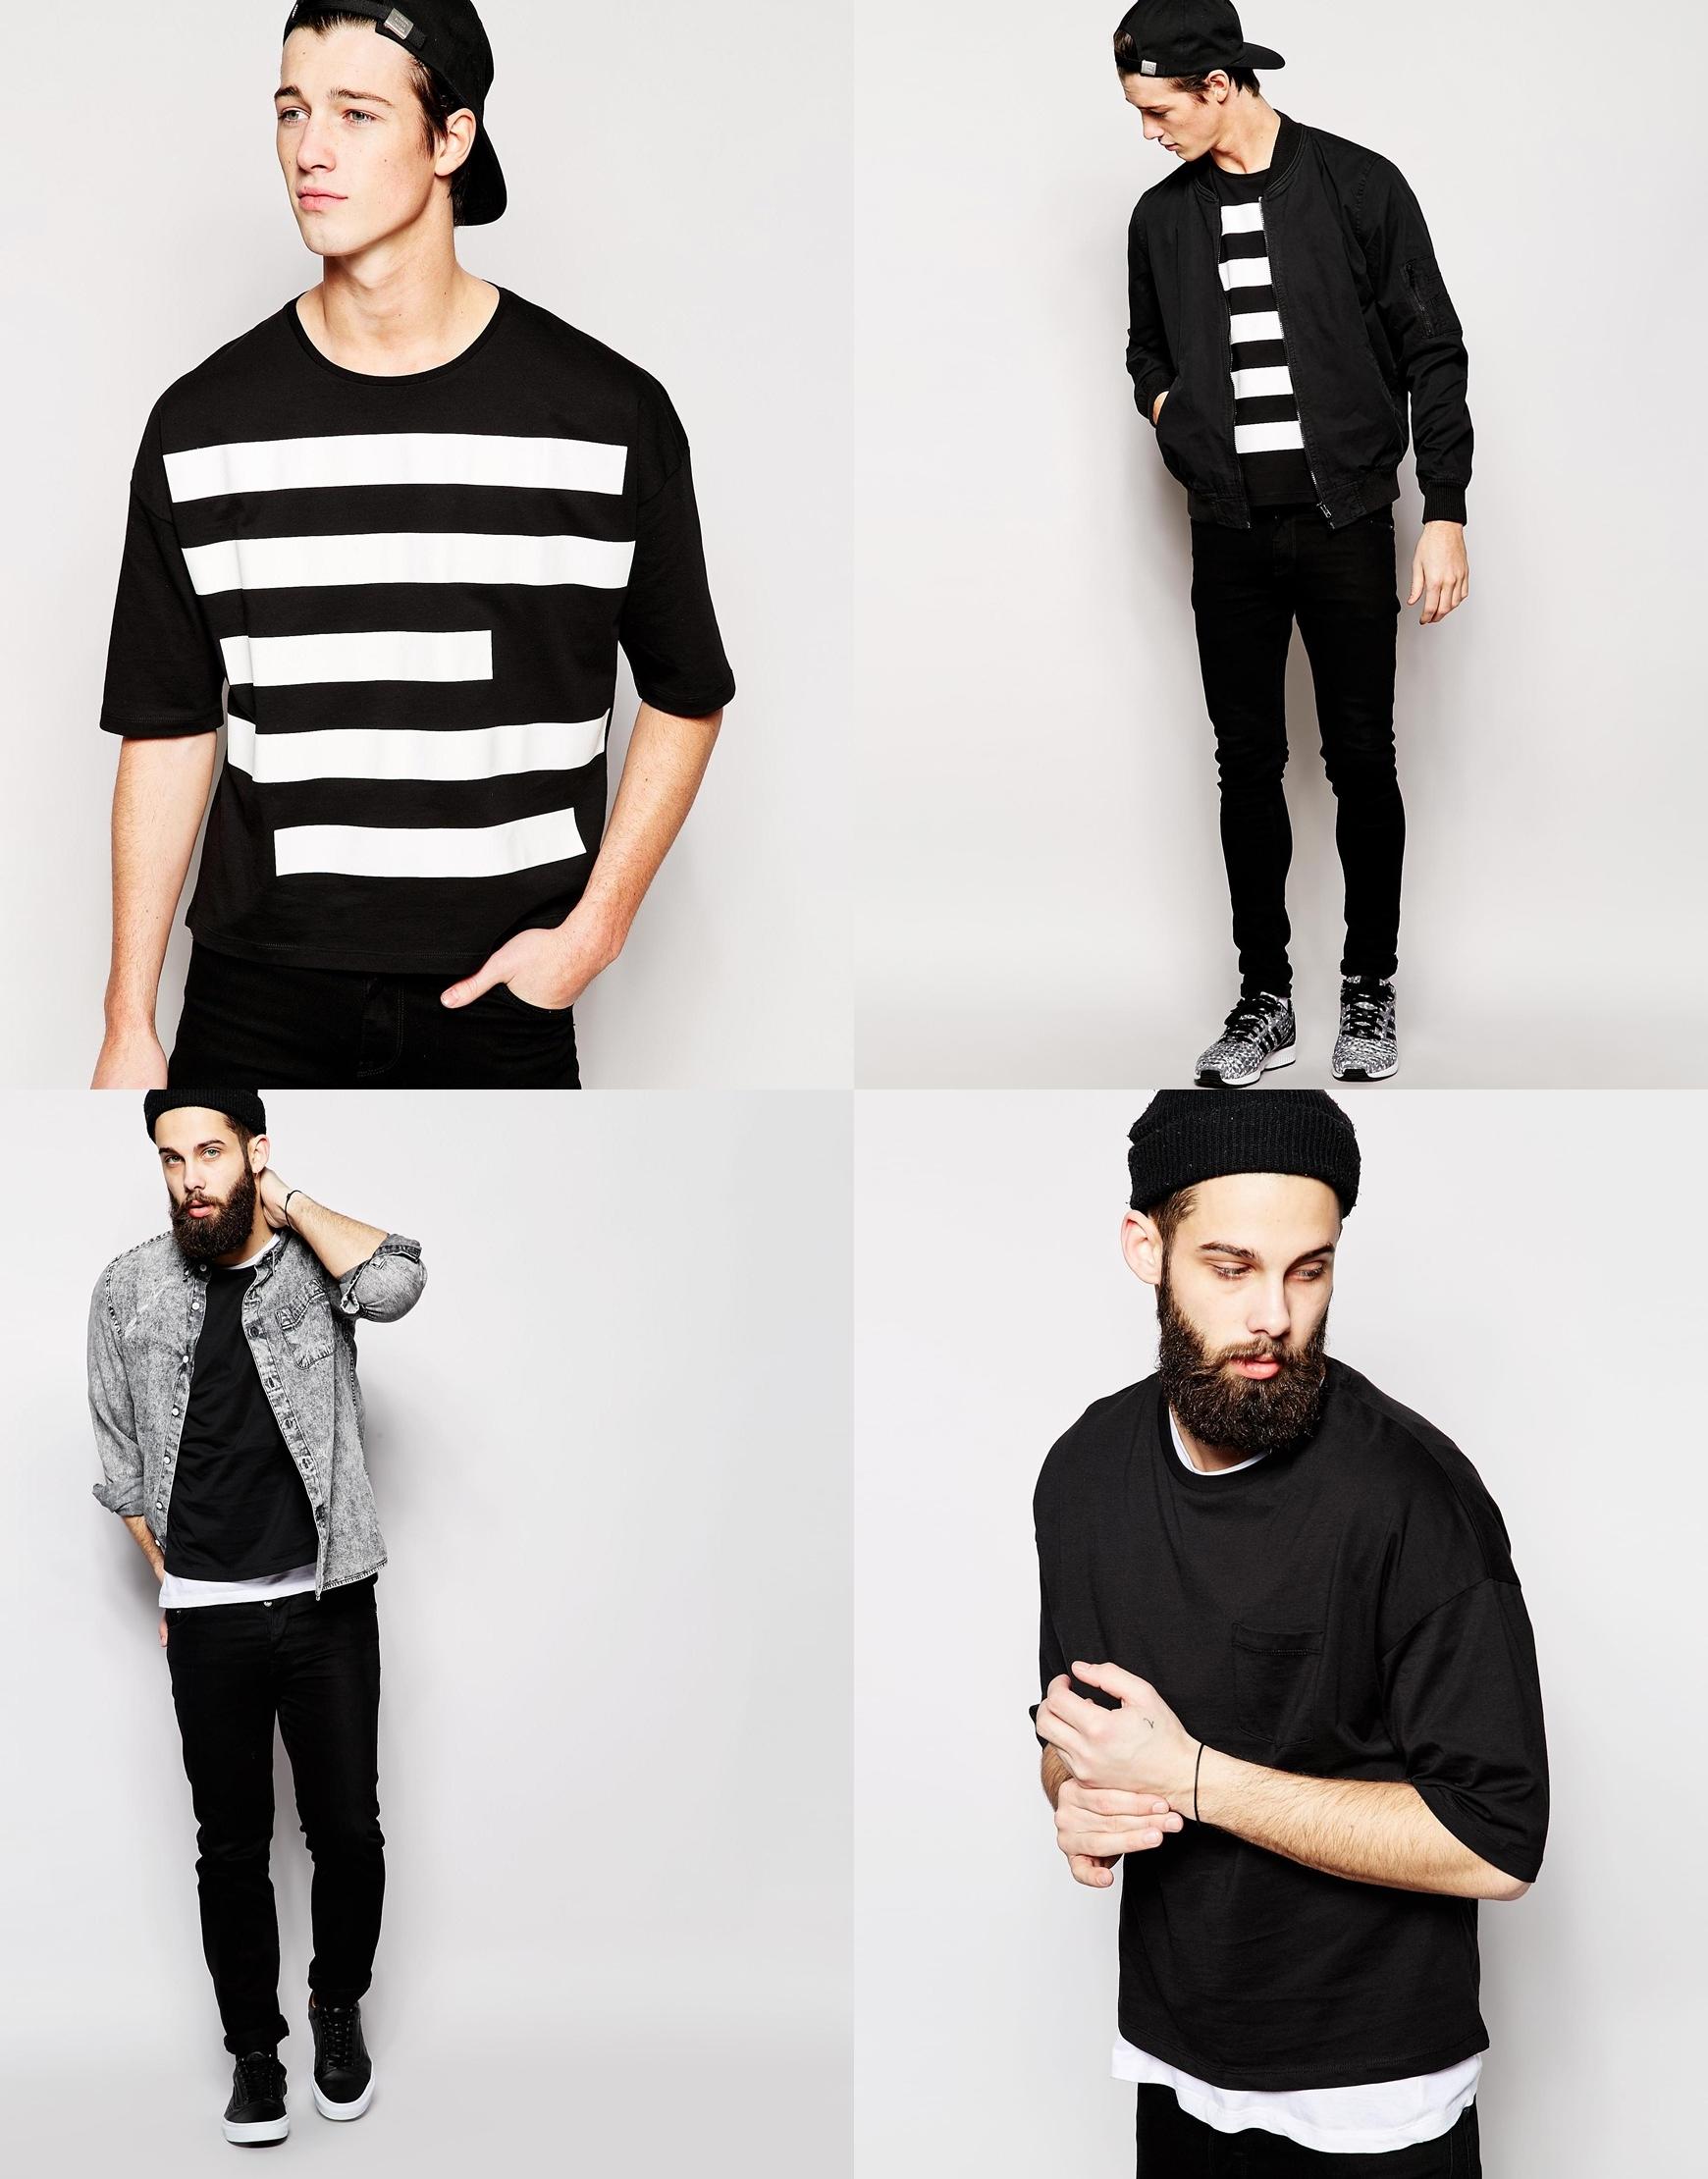 cropped masculino, cropped men, style, estilo, alex cursino, moda sem censura, blogger, fashion blogger, blogueiro de moda, cool hunter, moda masculina, fashion, 3